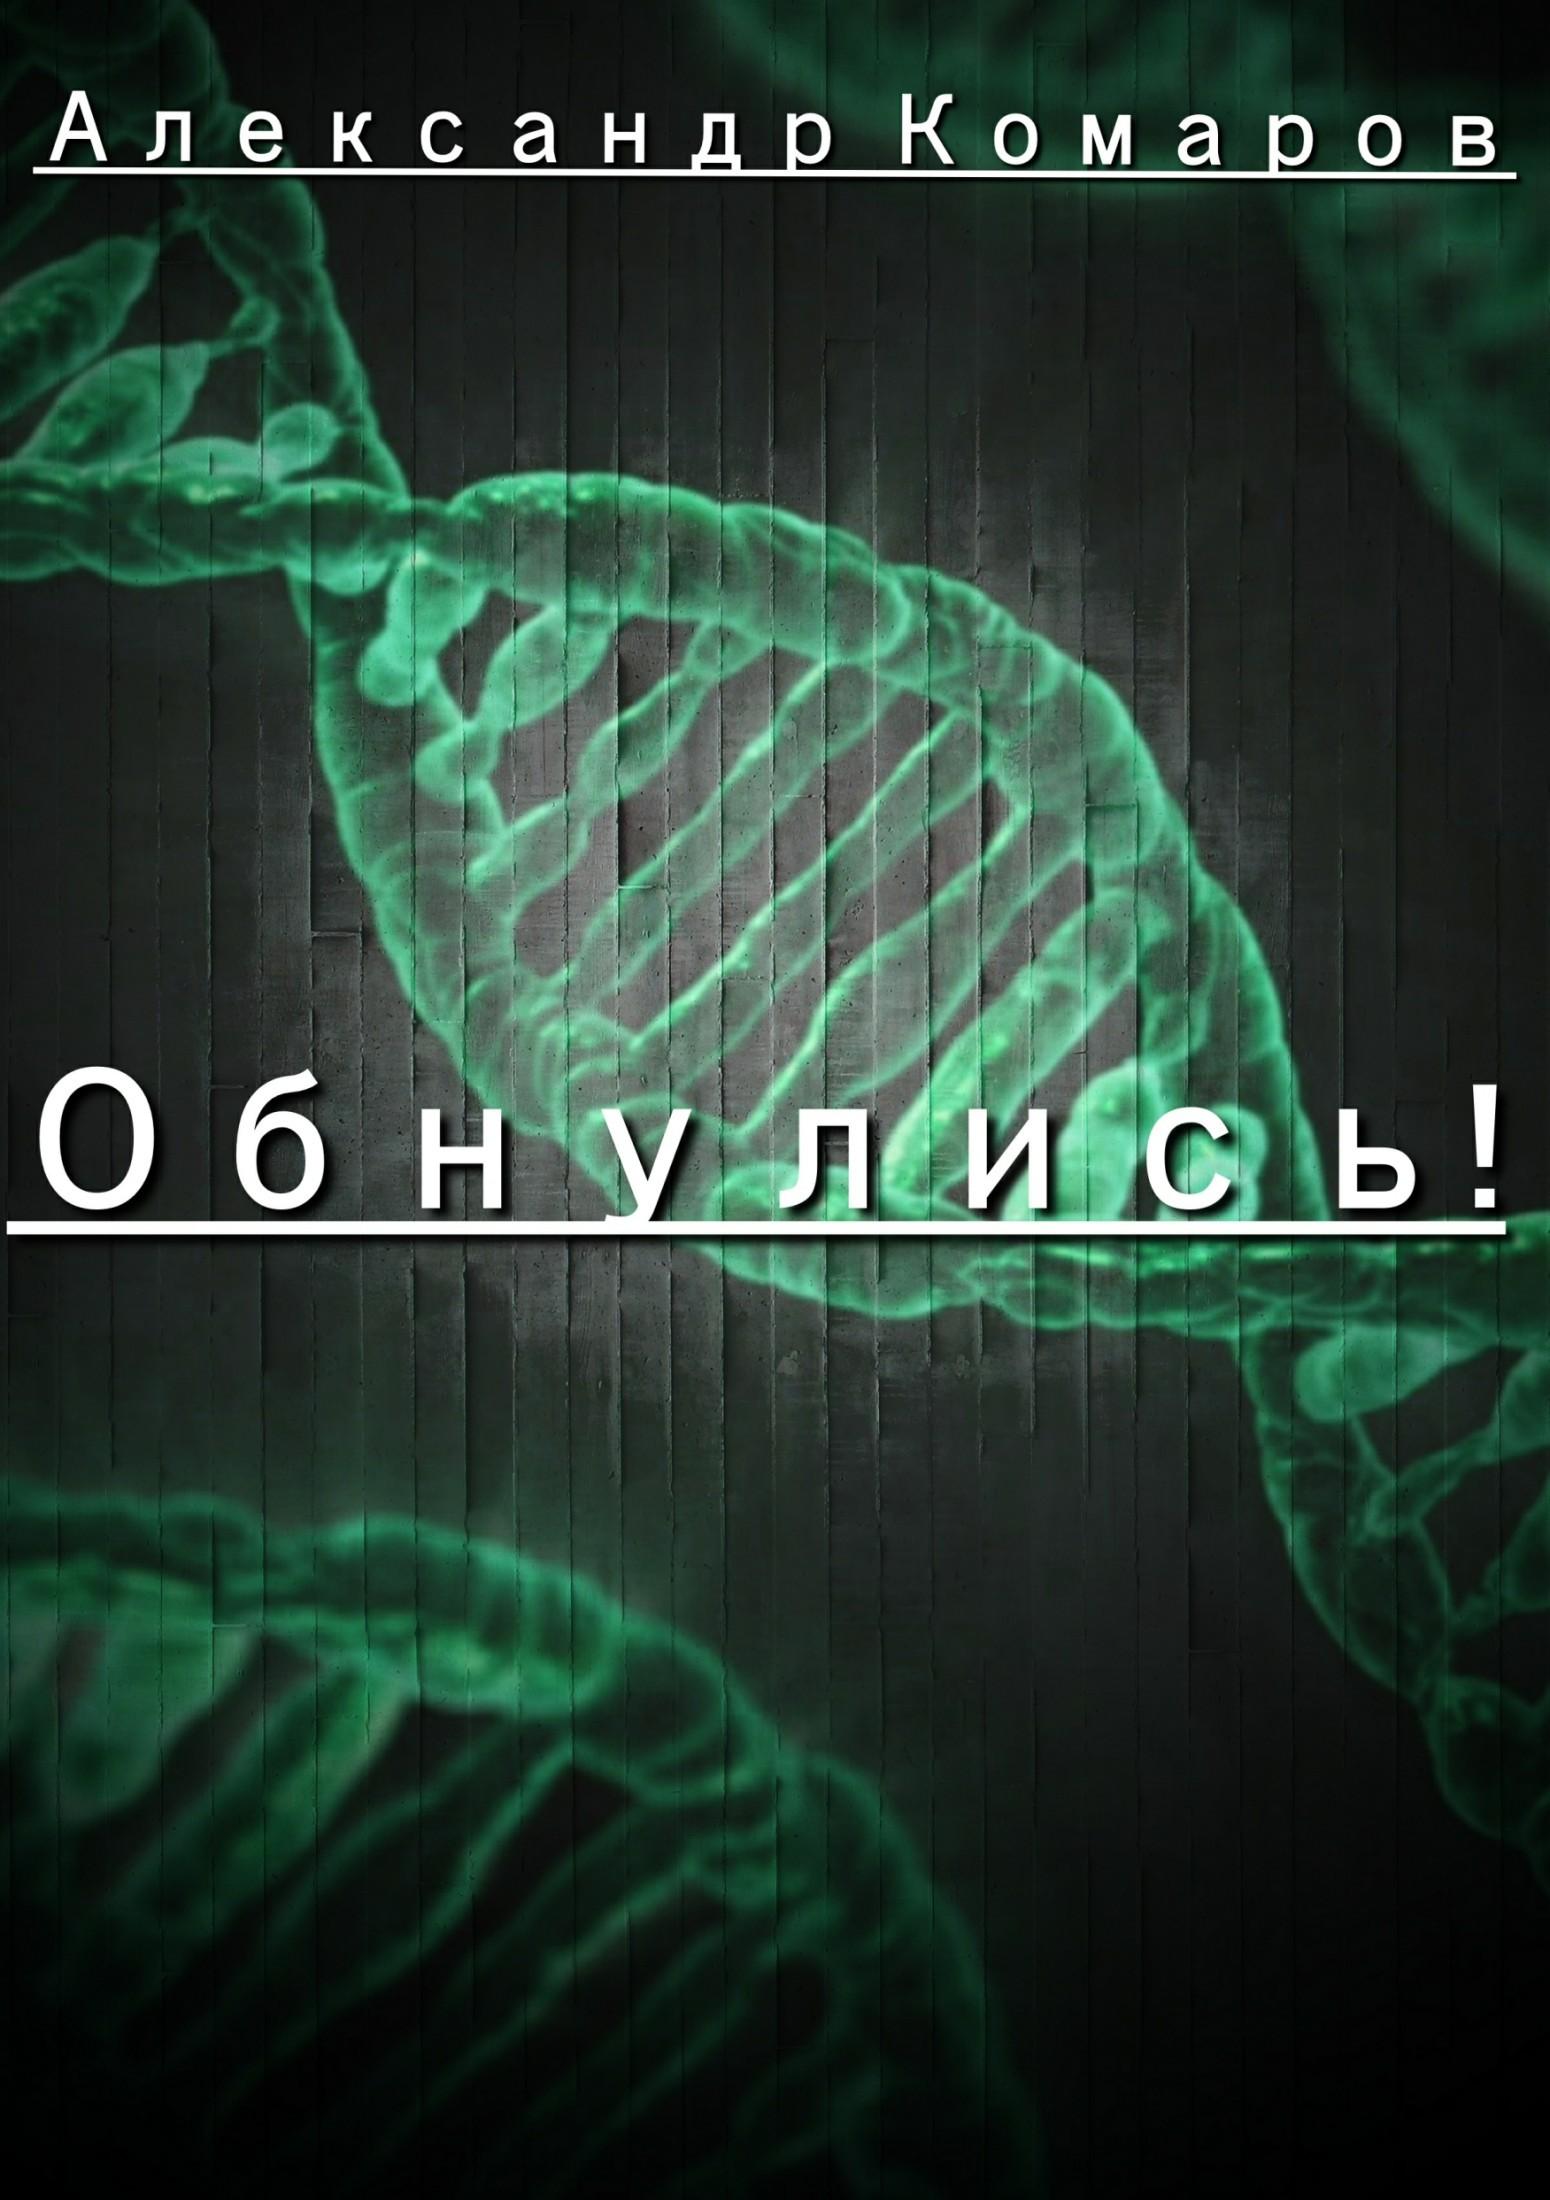 Александр Васильевич Комаров. Обнулись!